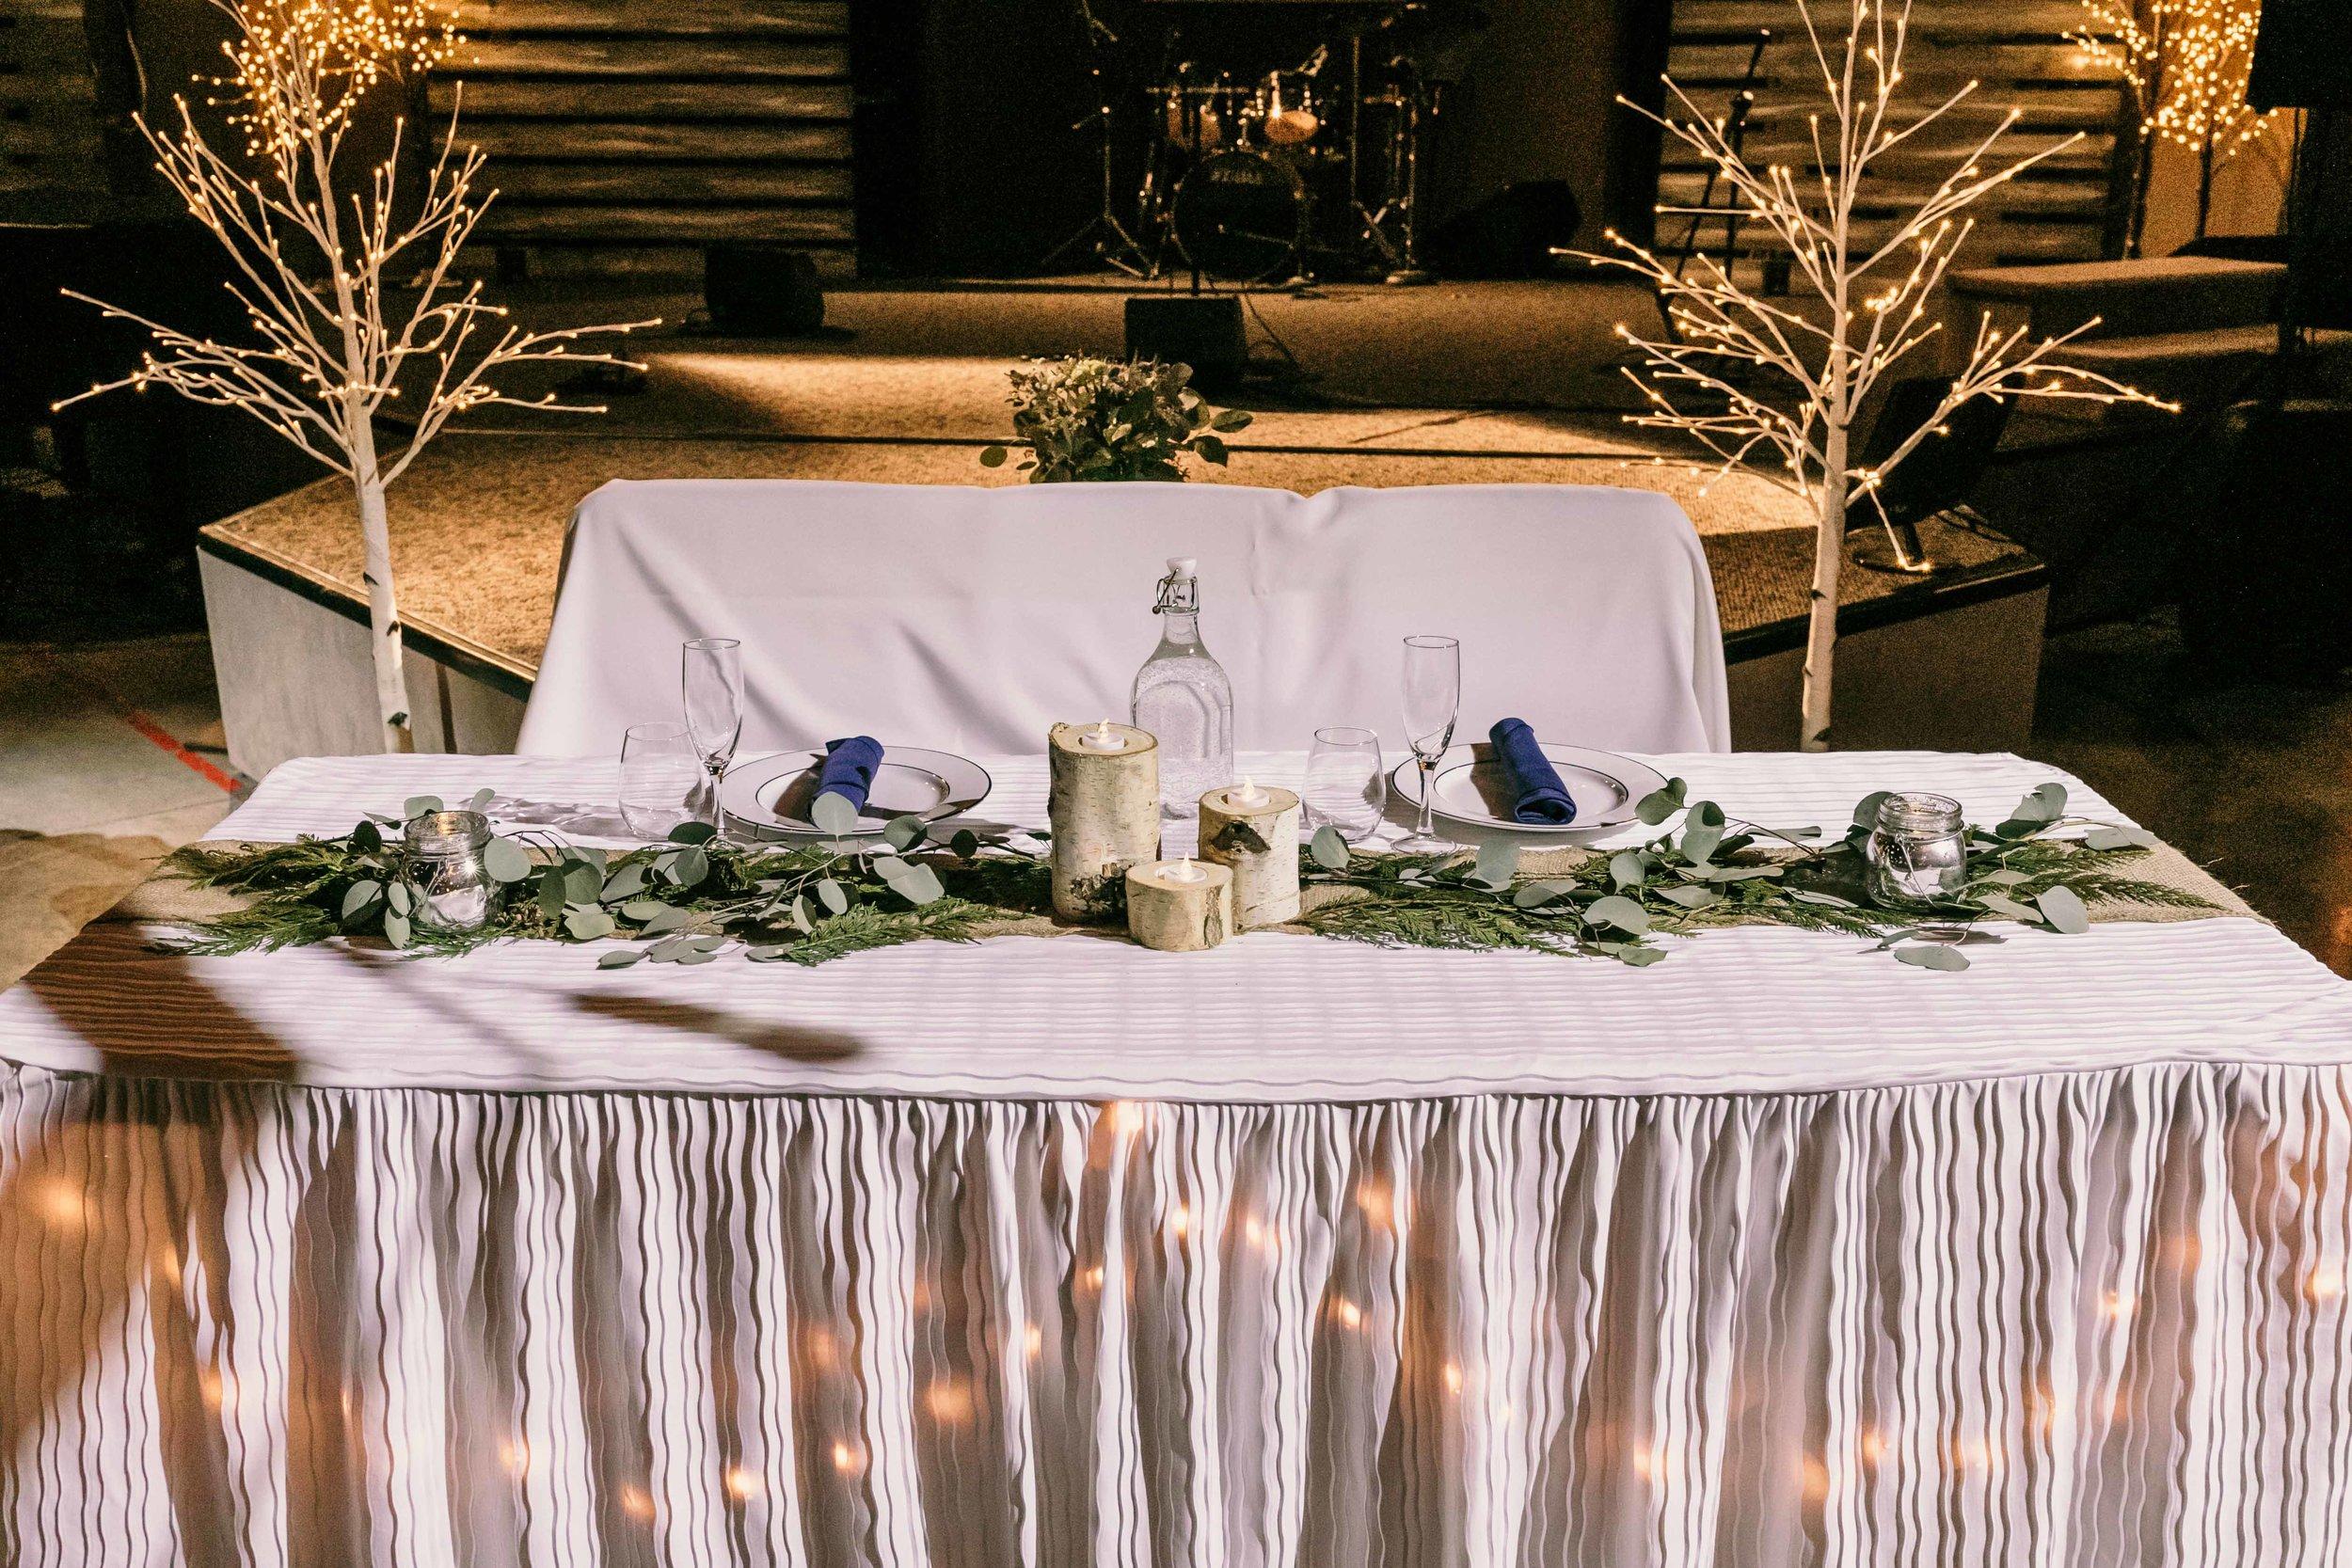 kilworth-memorial-chapel-wedding-101.jpg